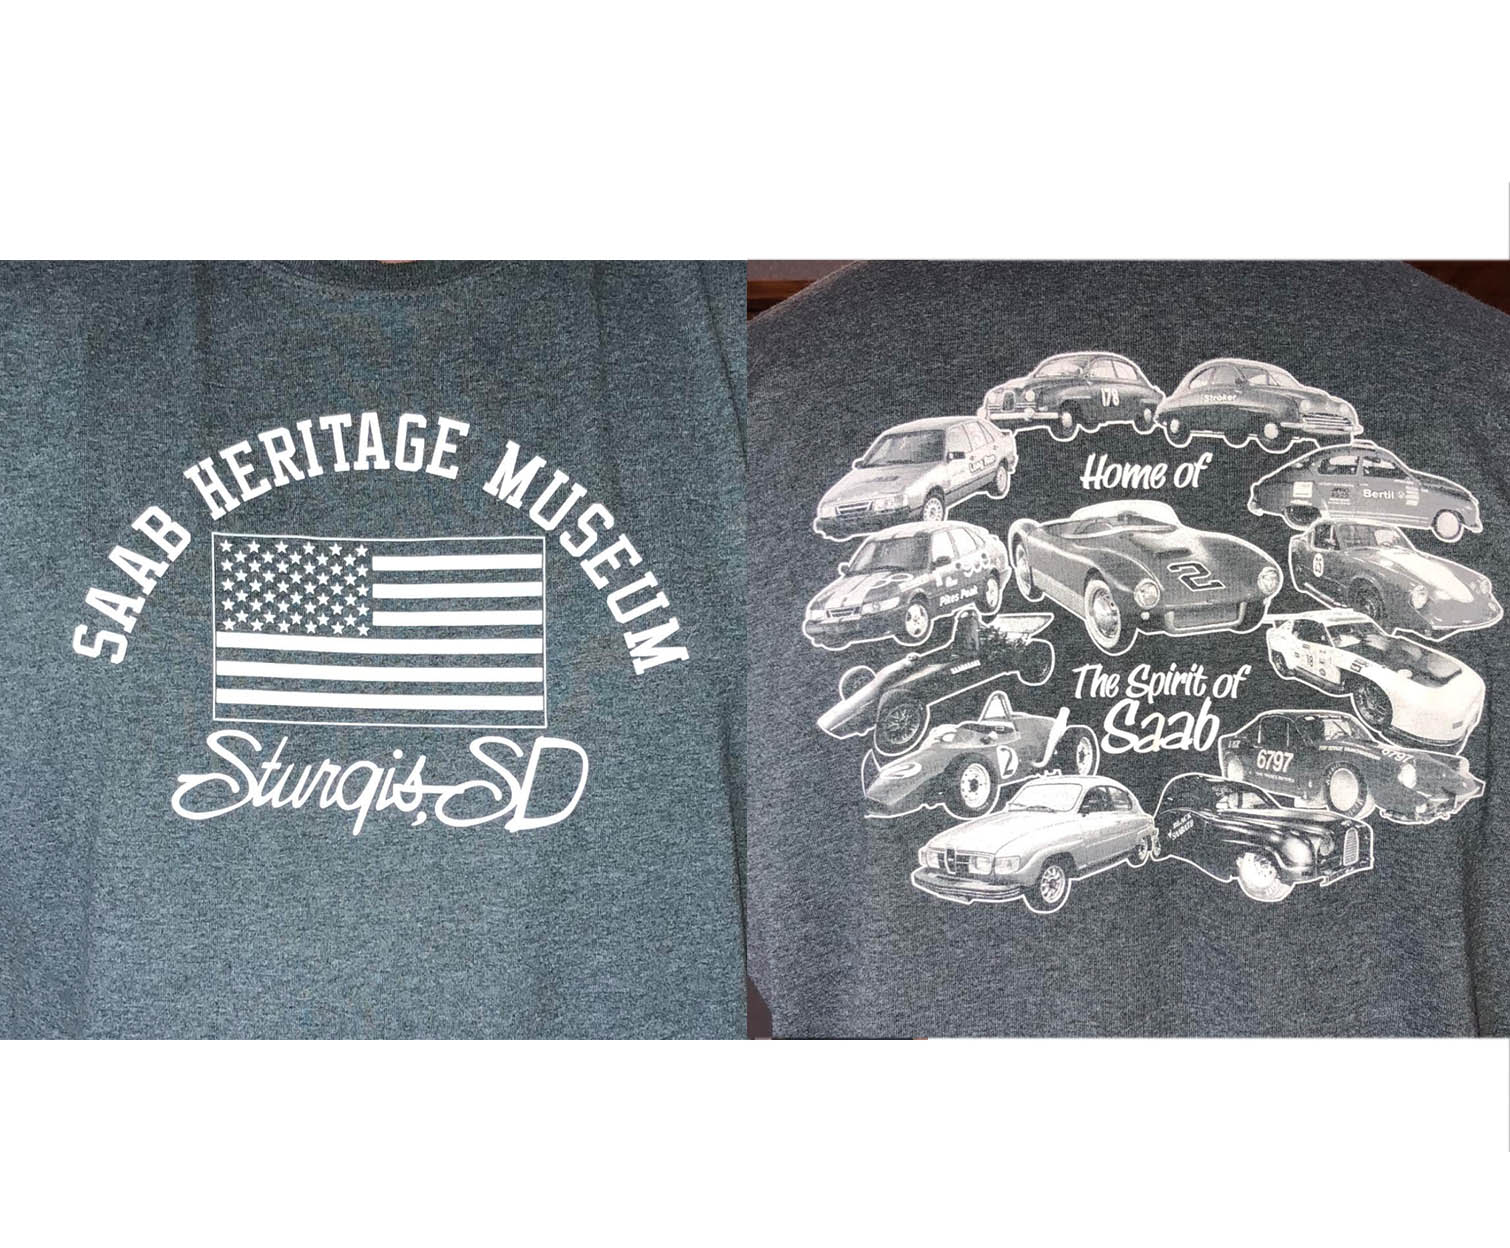 Saab Heritage Museum USA T-Shirt (Grey) 2X-Large (MENS)